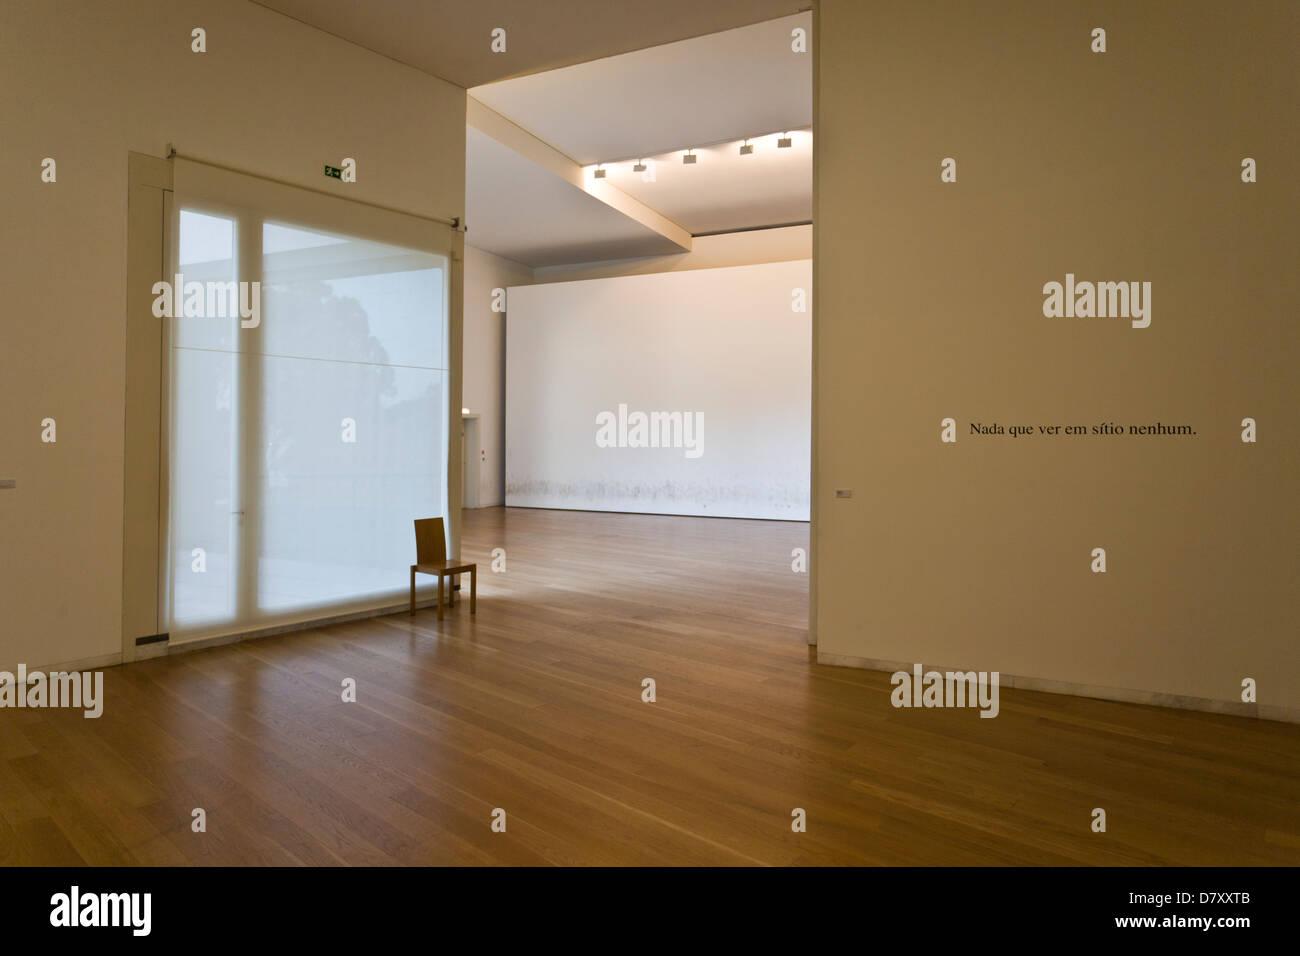 https://c8.alamy.com/comp/D7XXTB/interior-of-serralves-museum-in-porto-portugal-D7XXTB.jpg